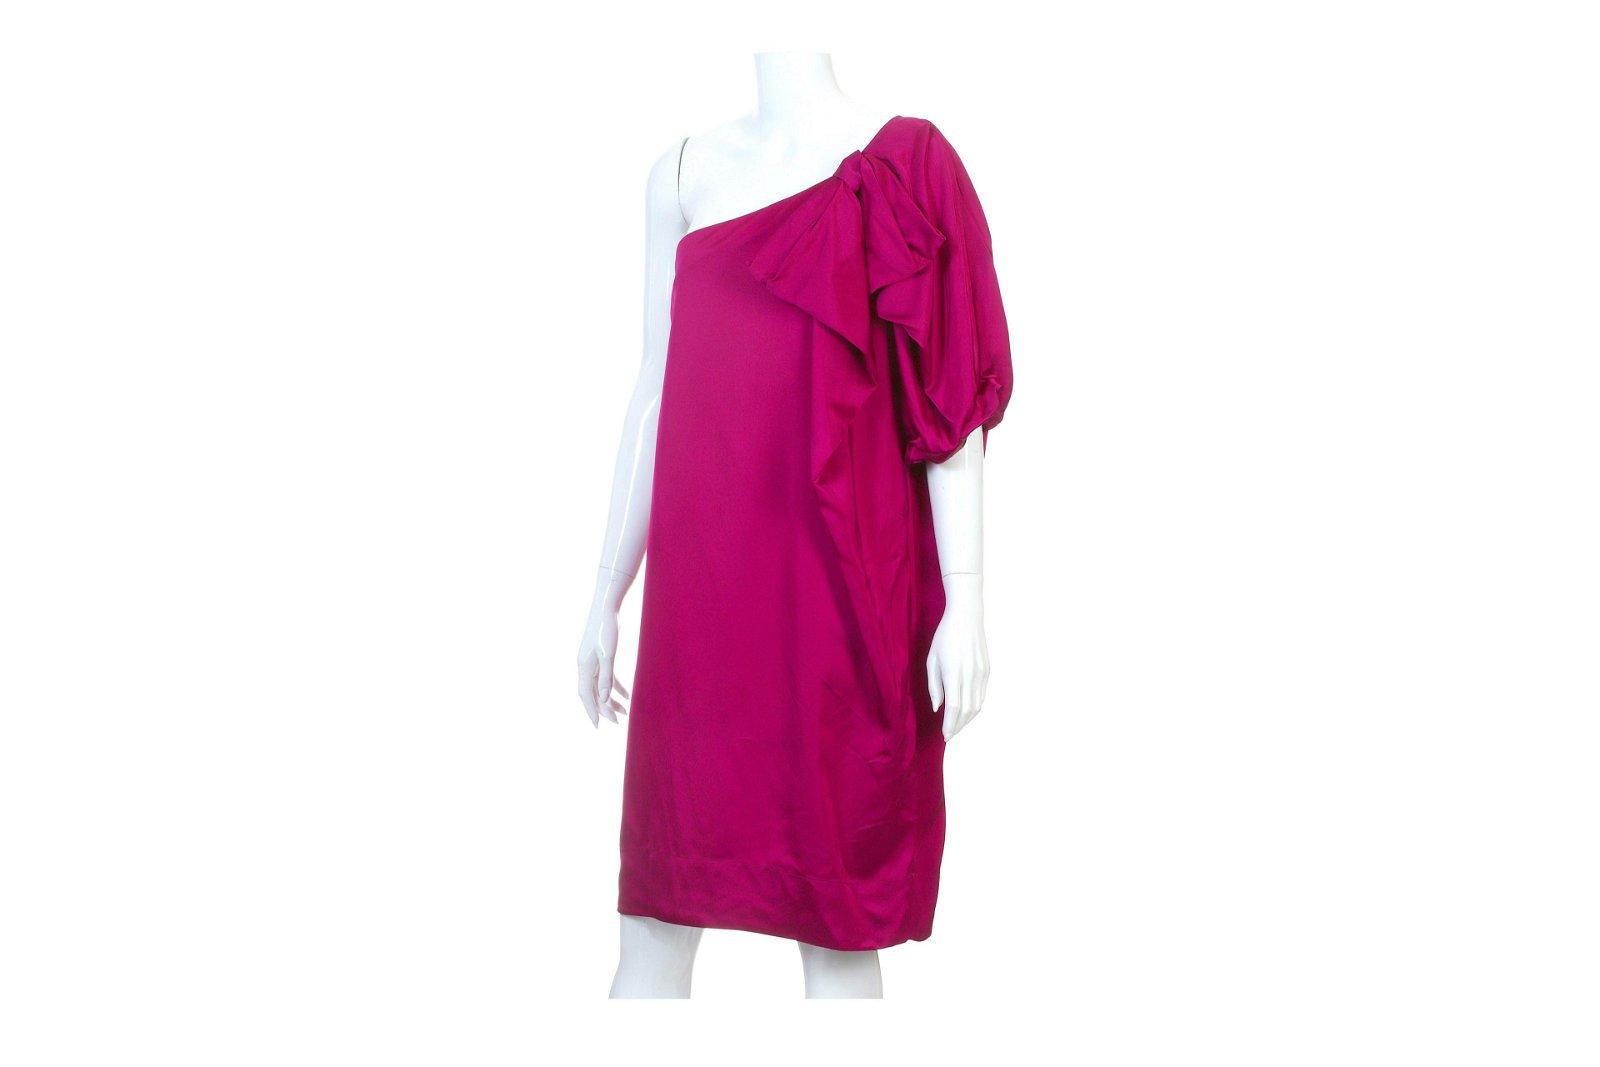 Stella McCartney Magenta Dress